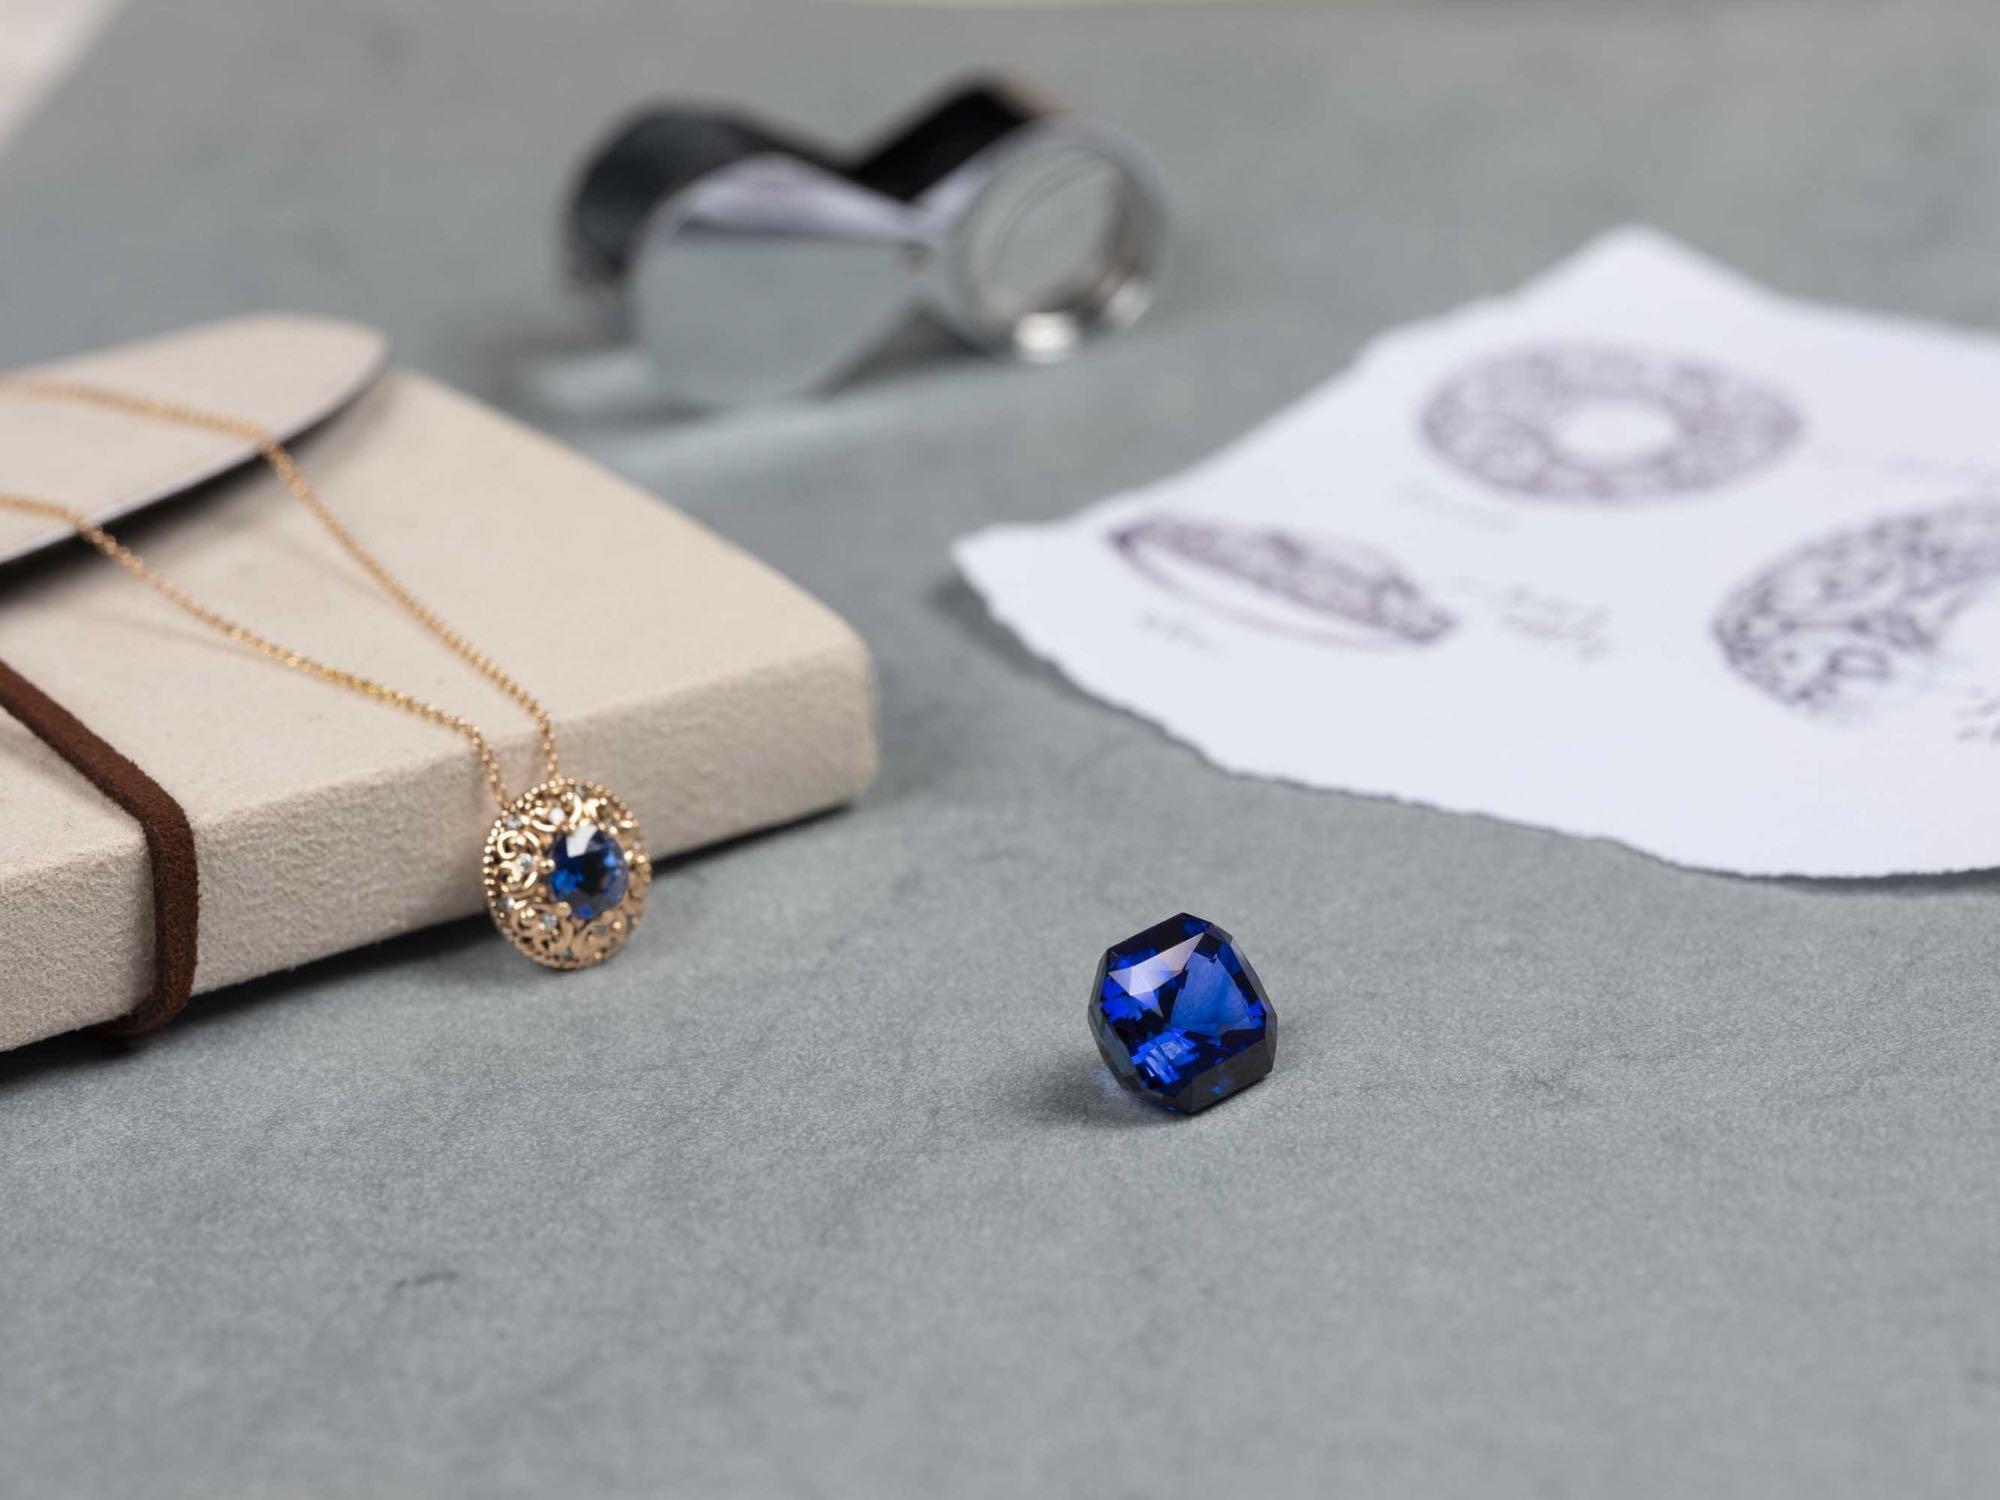 Jewellery Product Photography Singapore Coco Creative Studio-6